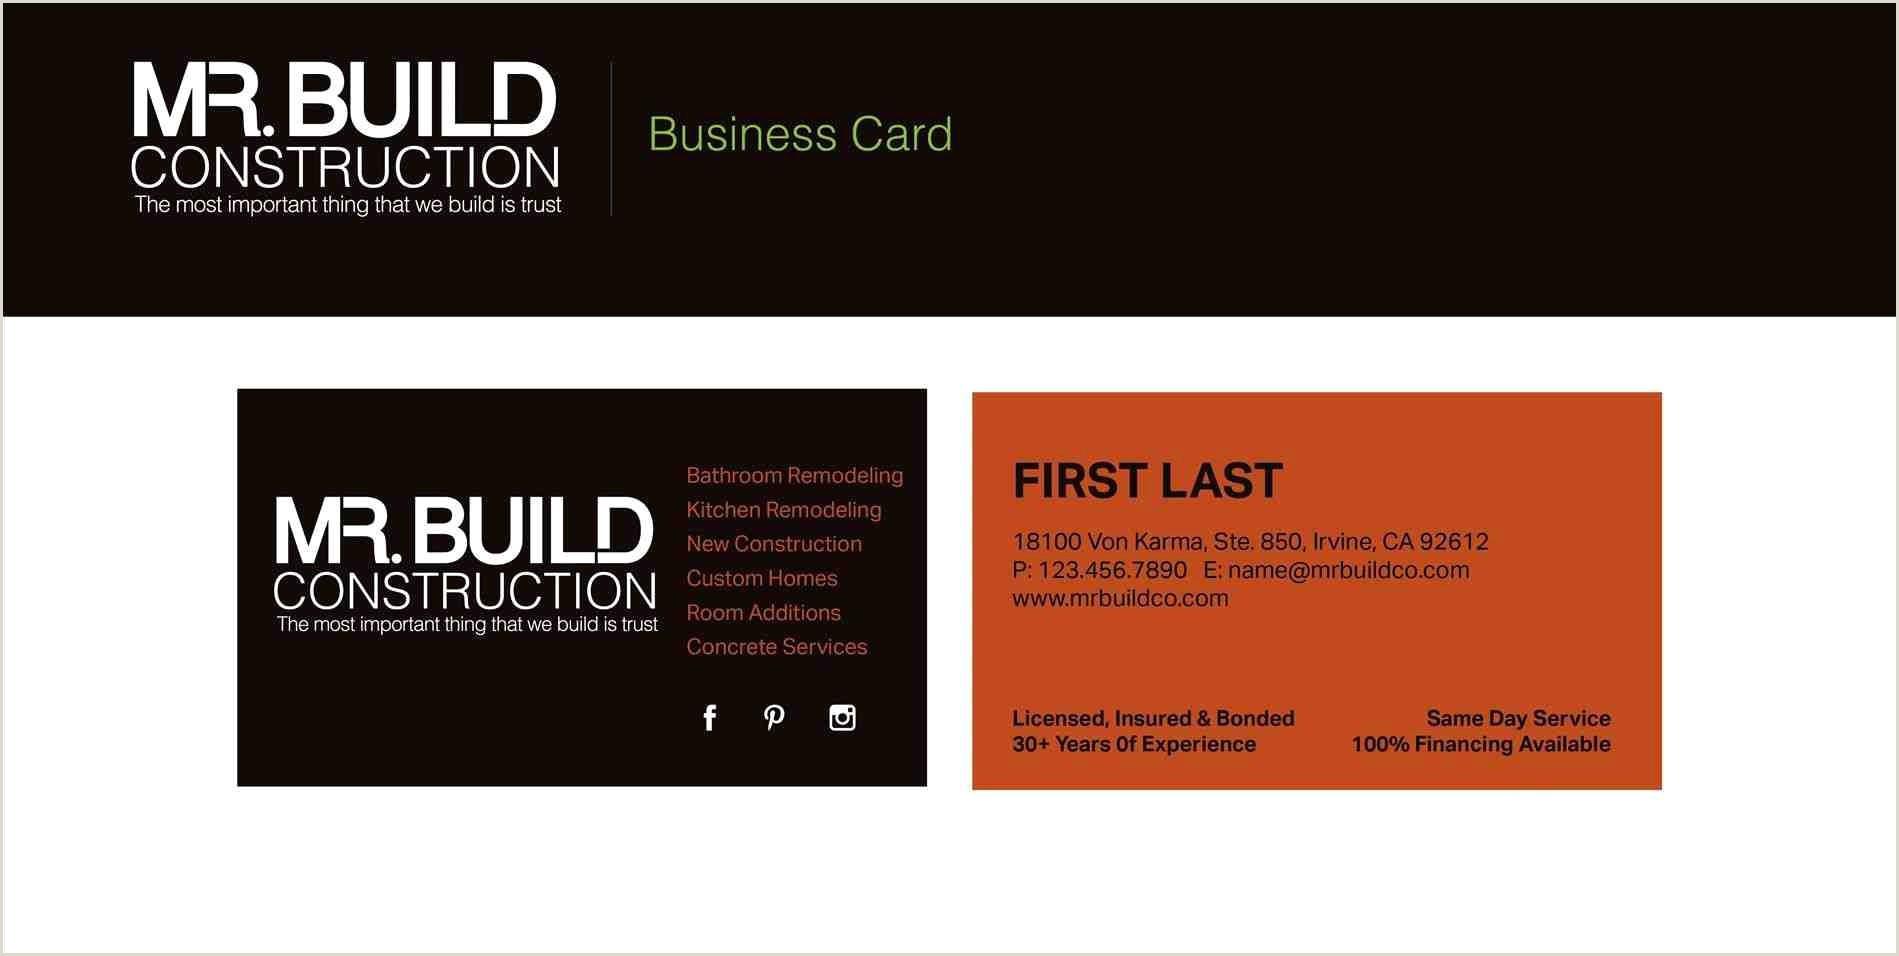 Network Business Card Templates 14 Popular Hardwood Flooring Business Card Template